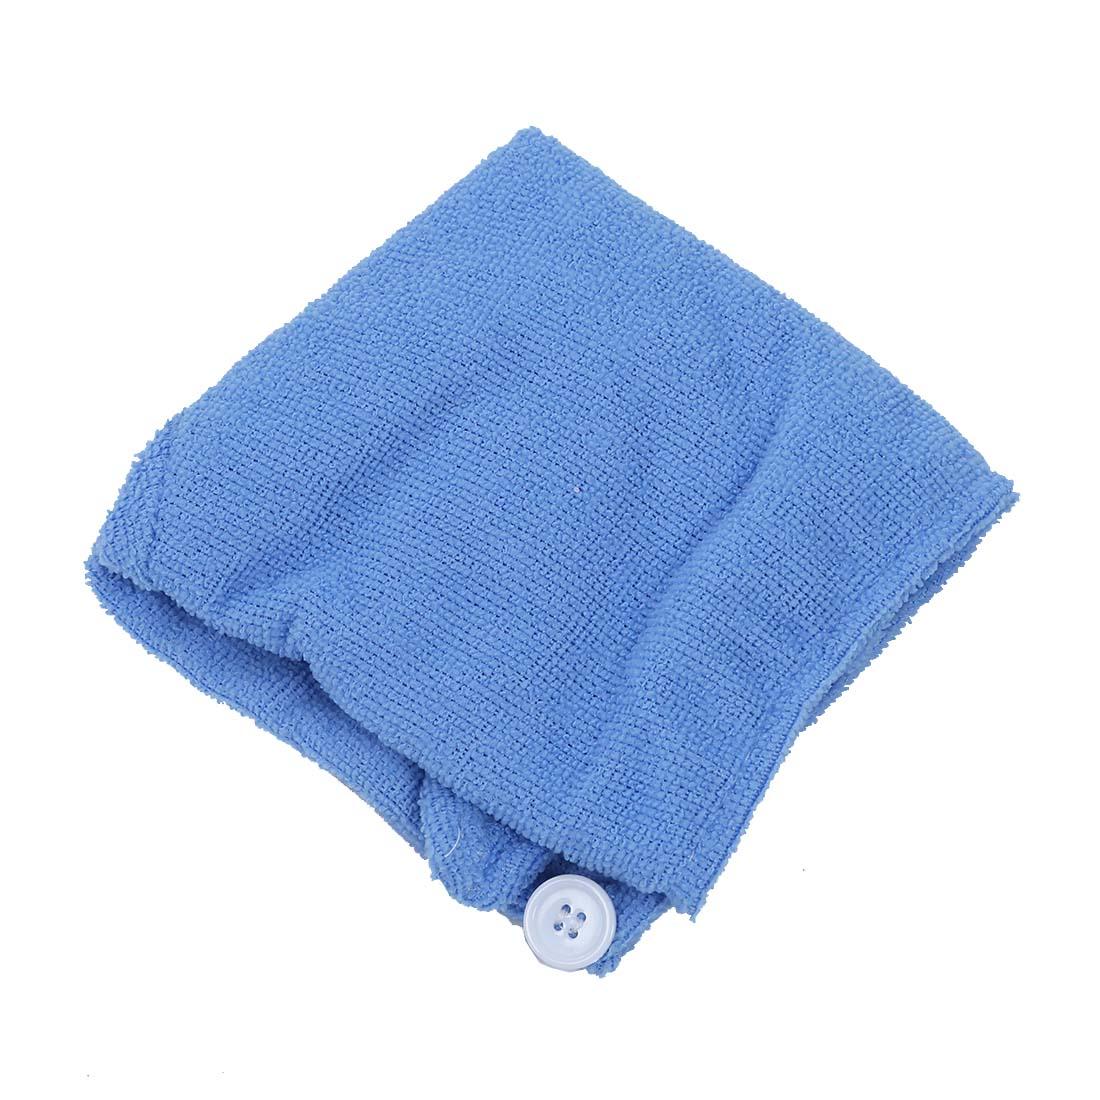 towel hair wrap instructions